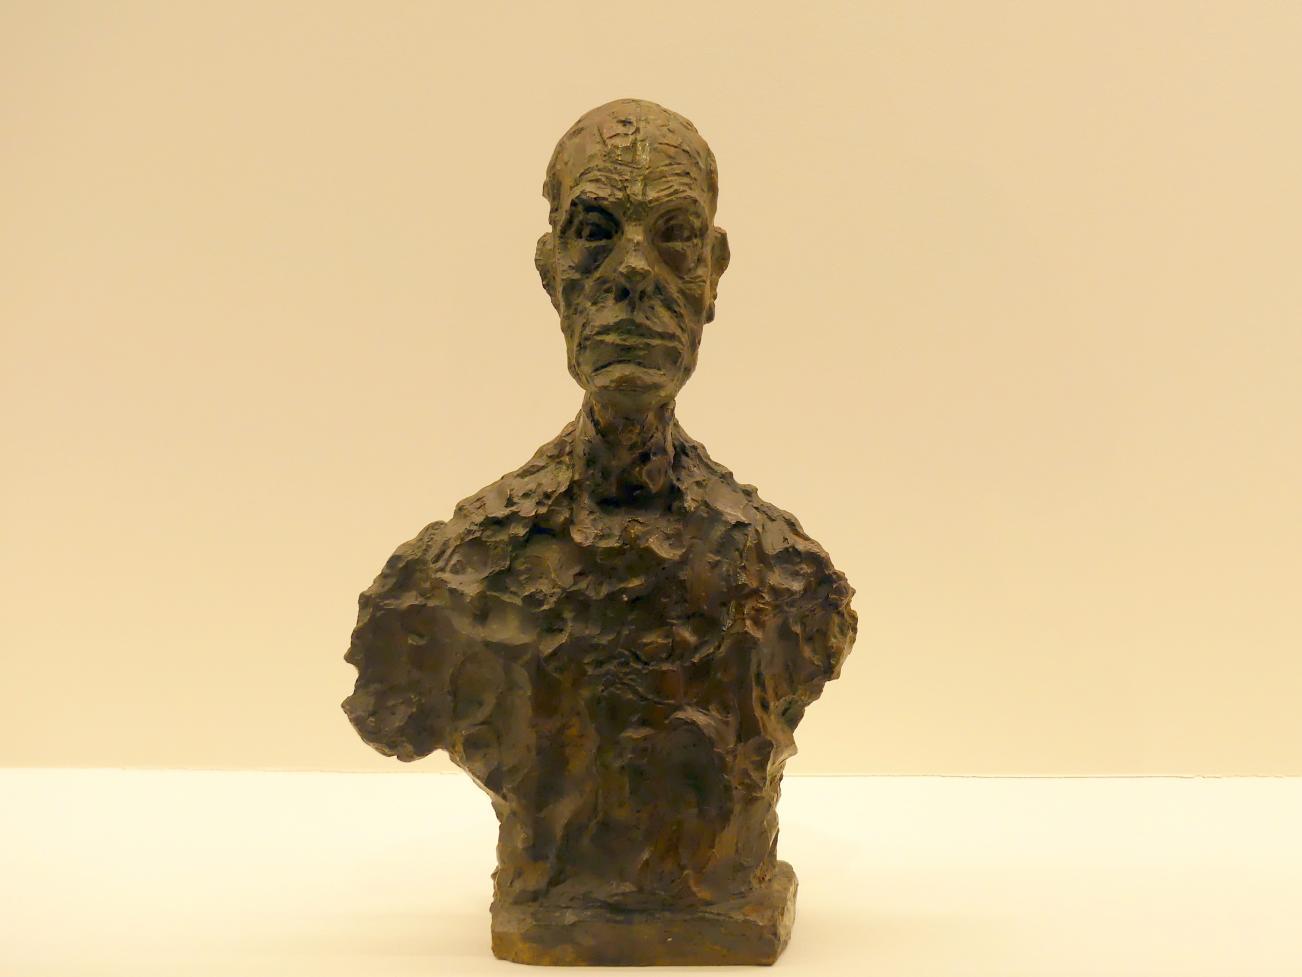 Alberto Giacometti: Büste von Diego, 1962